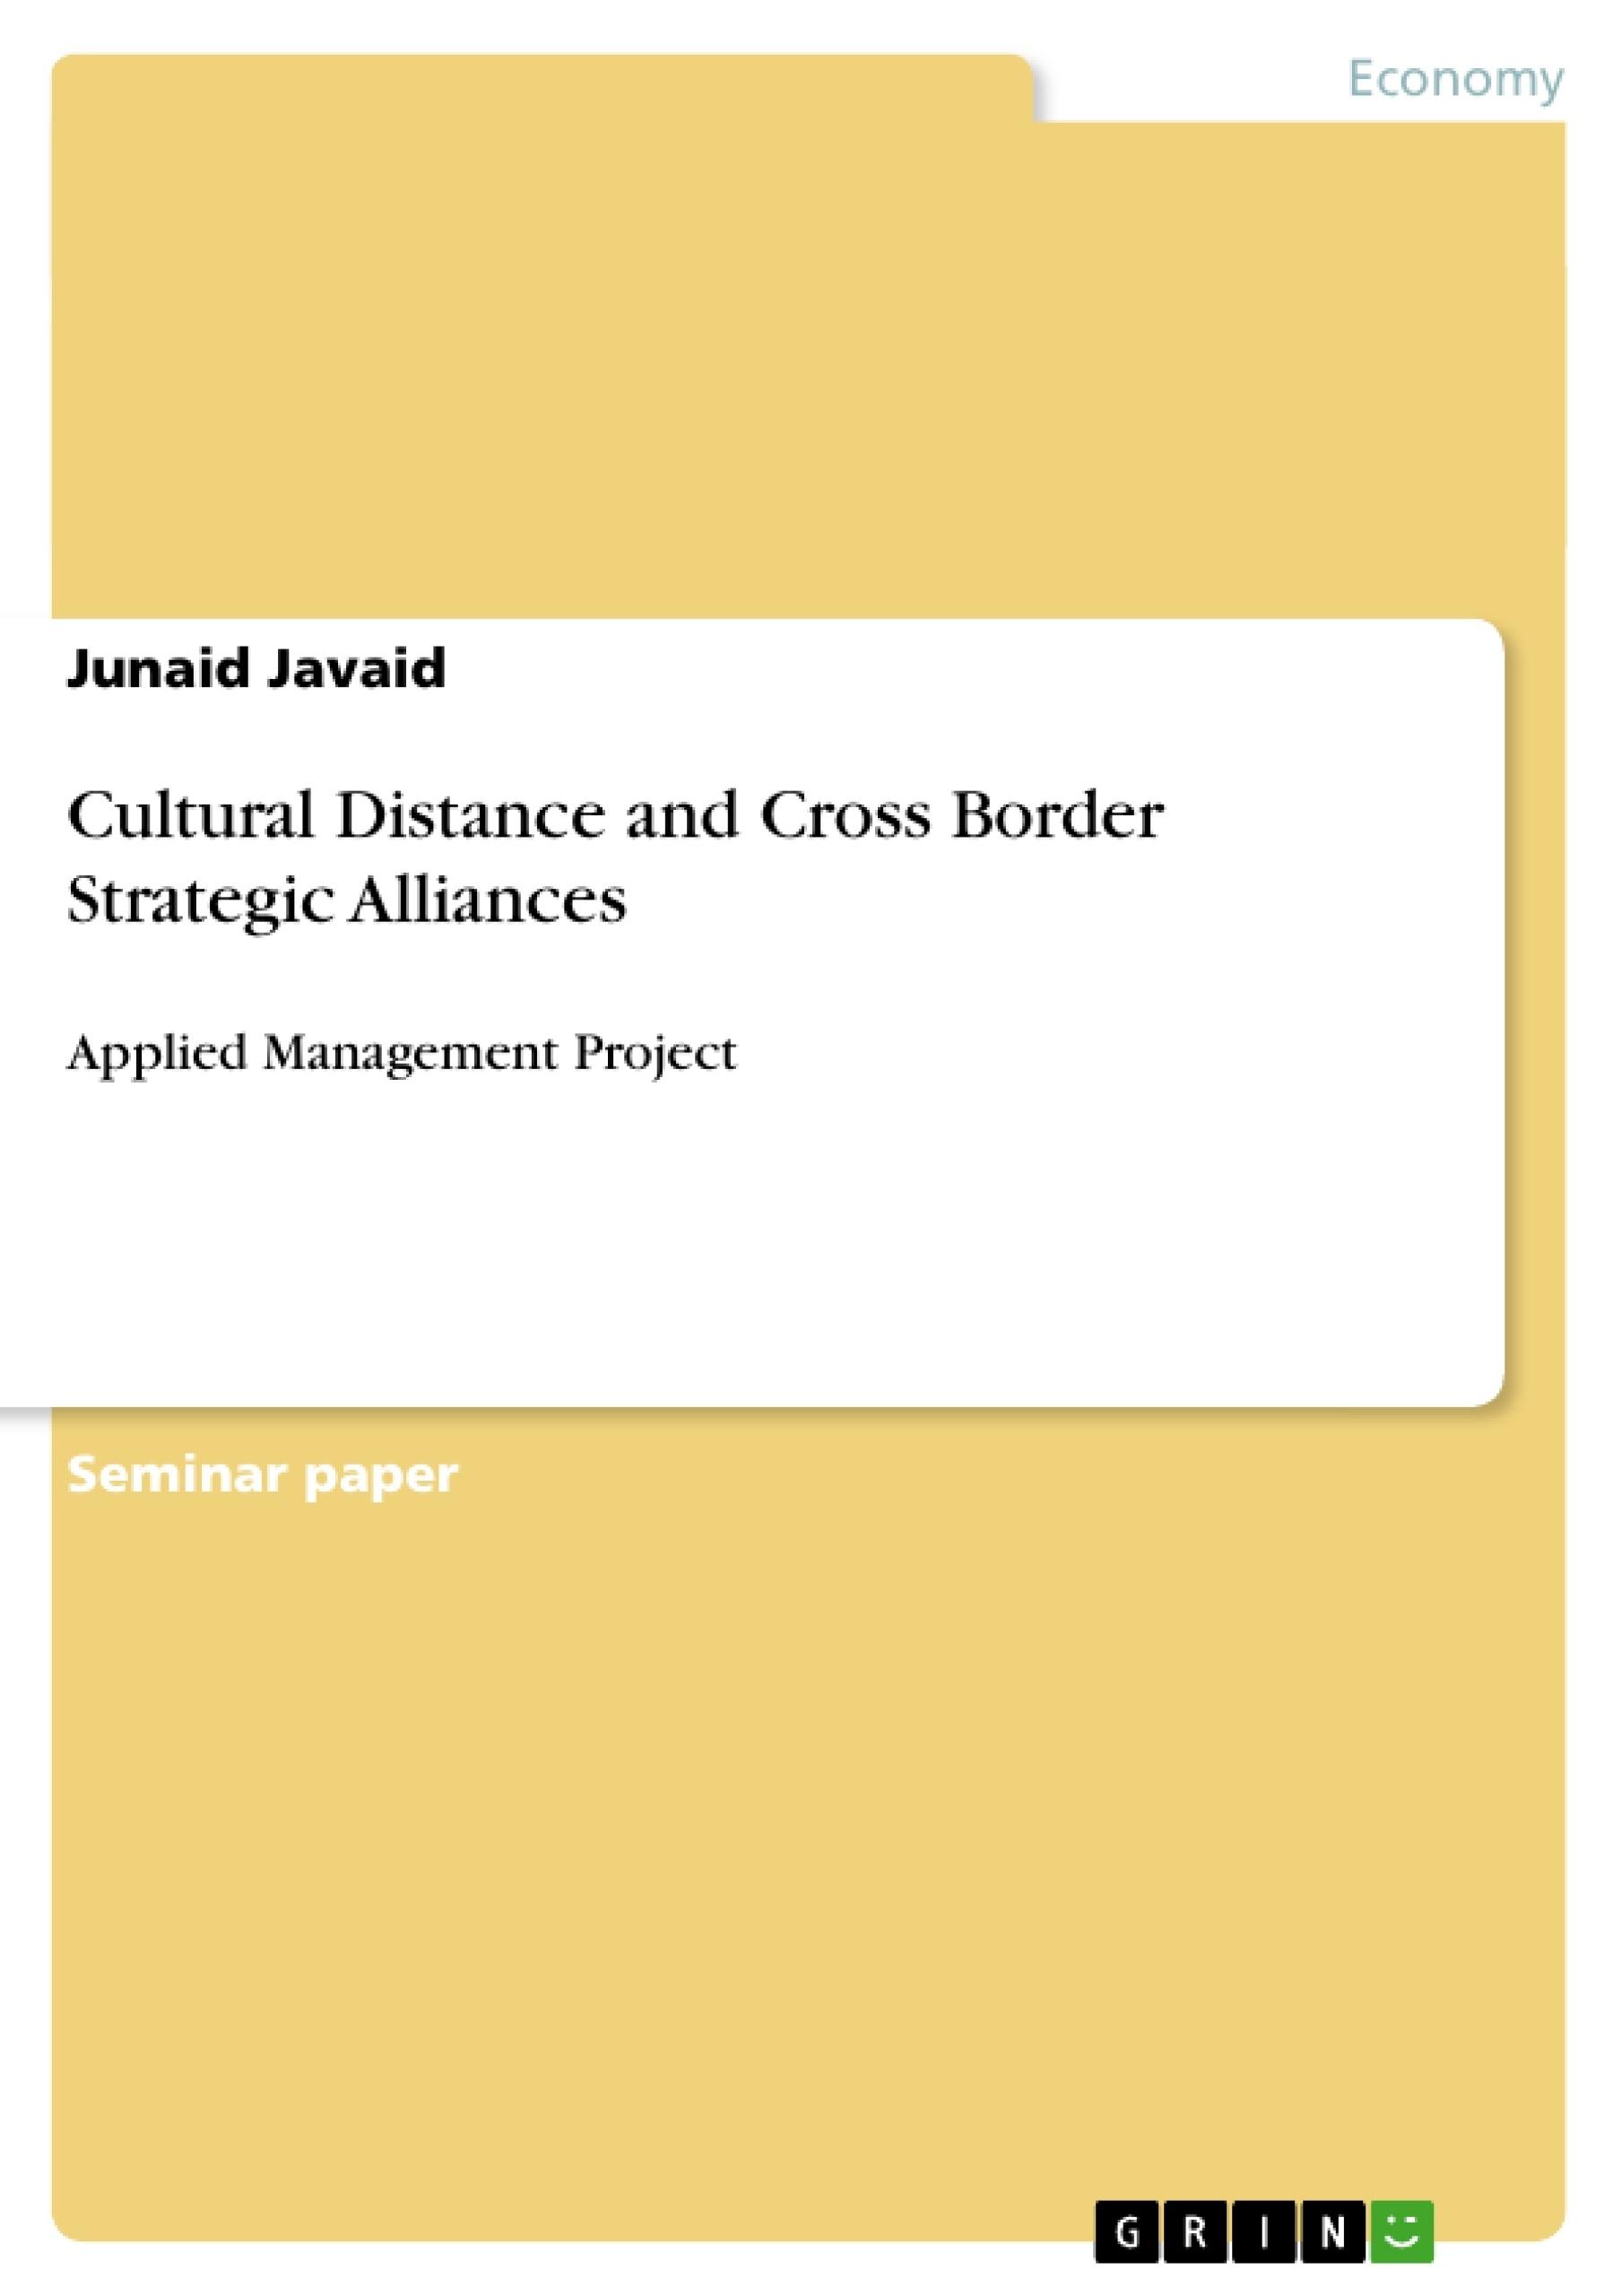 Title: Cultural Distance and Cross Border Strategic Alliances